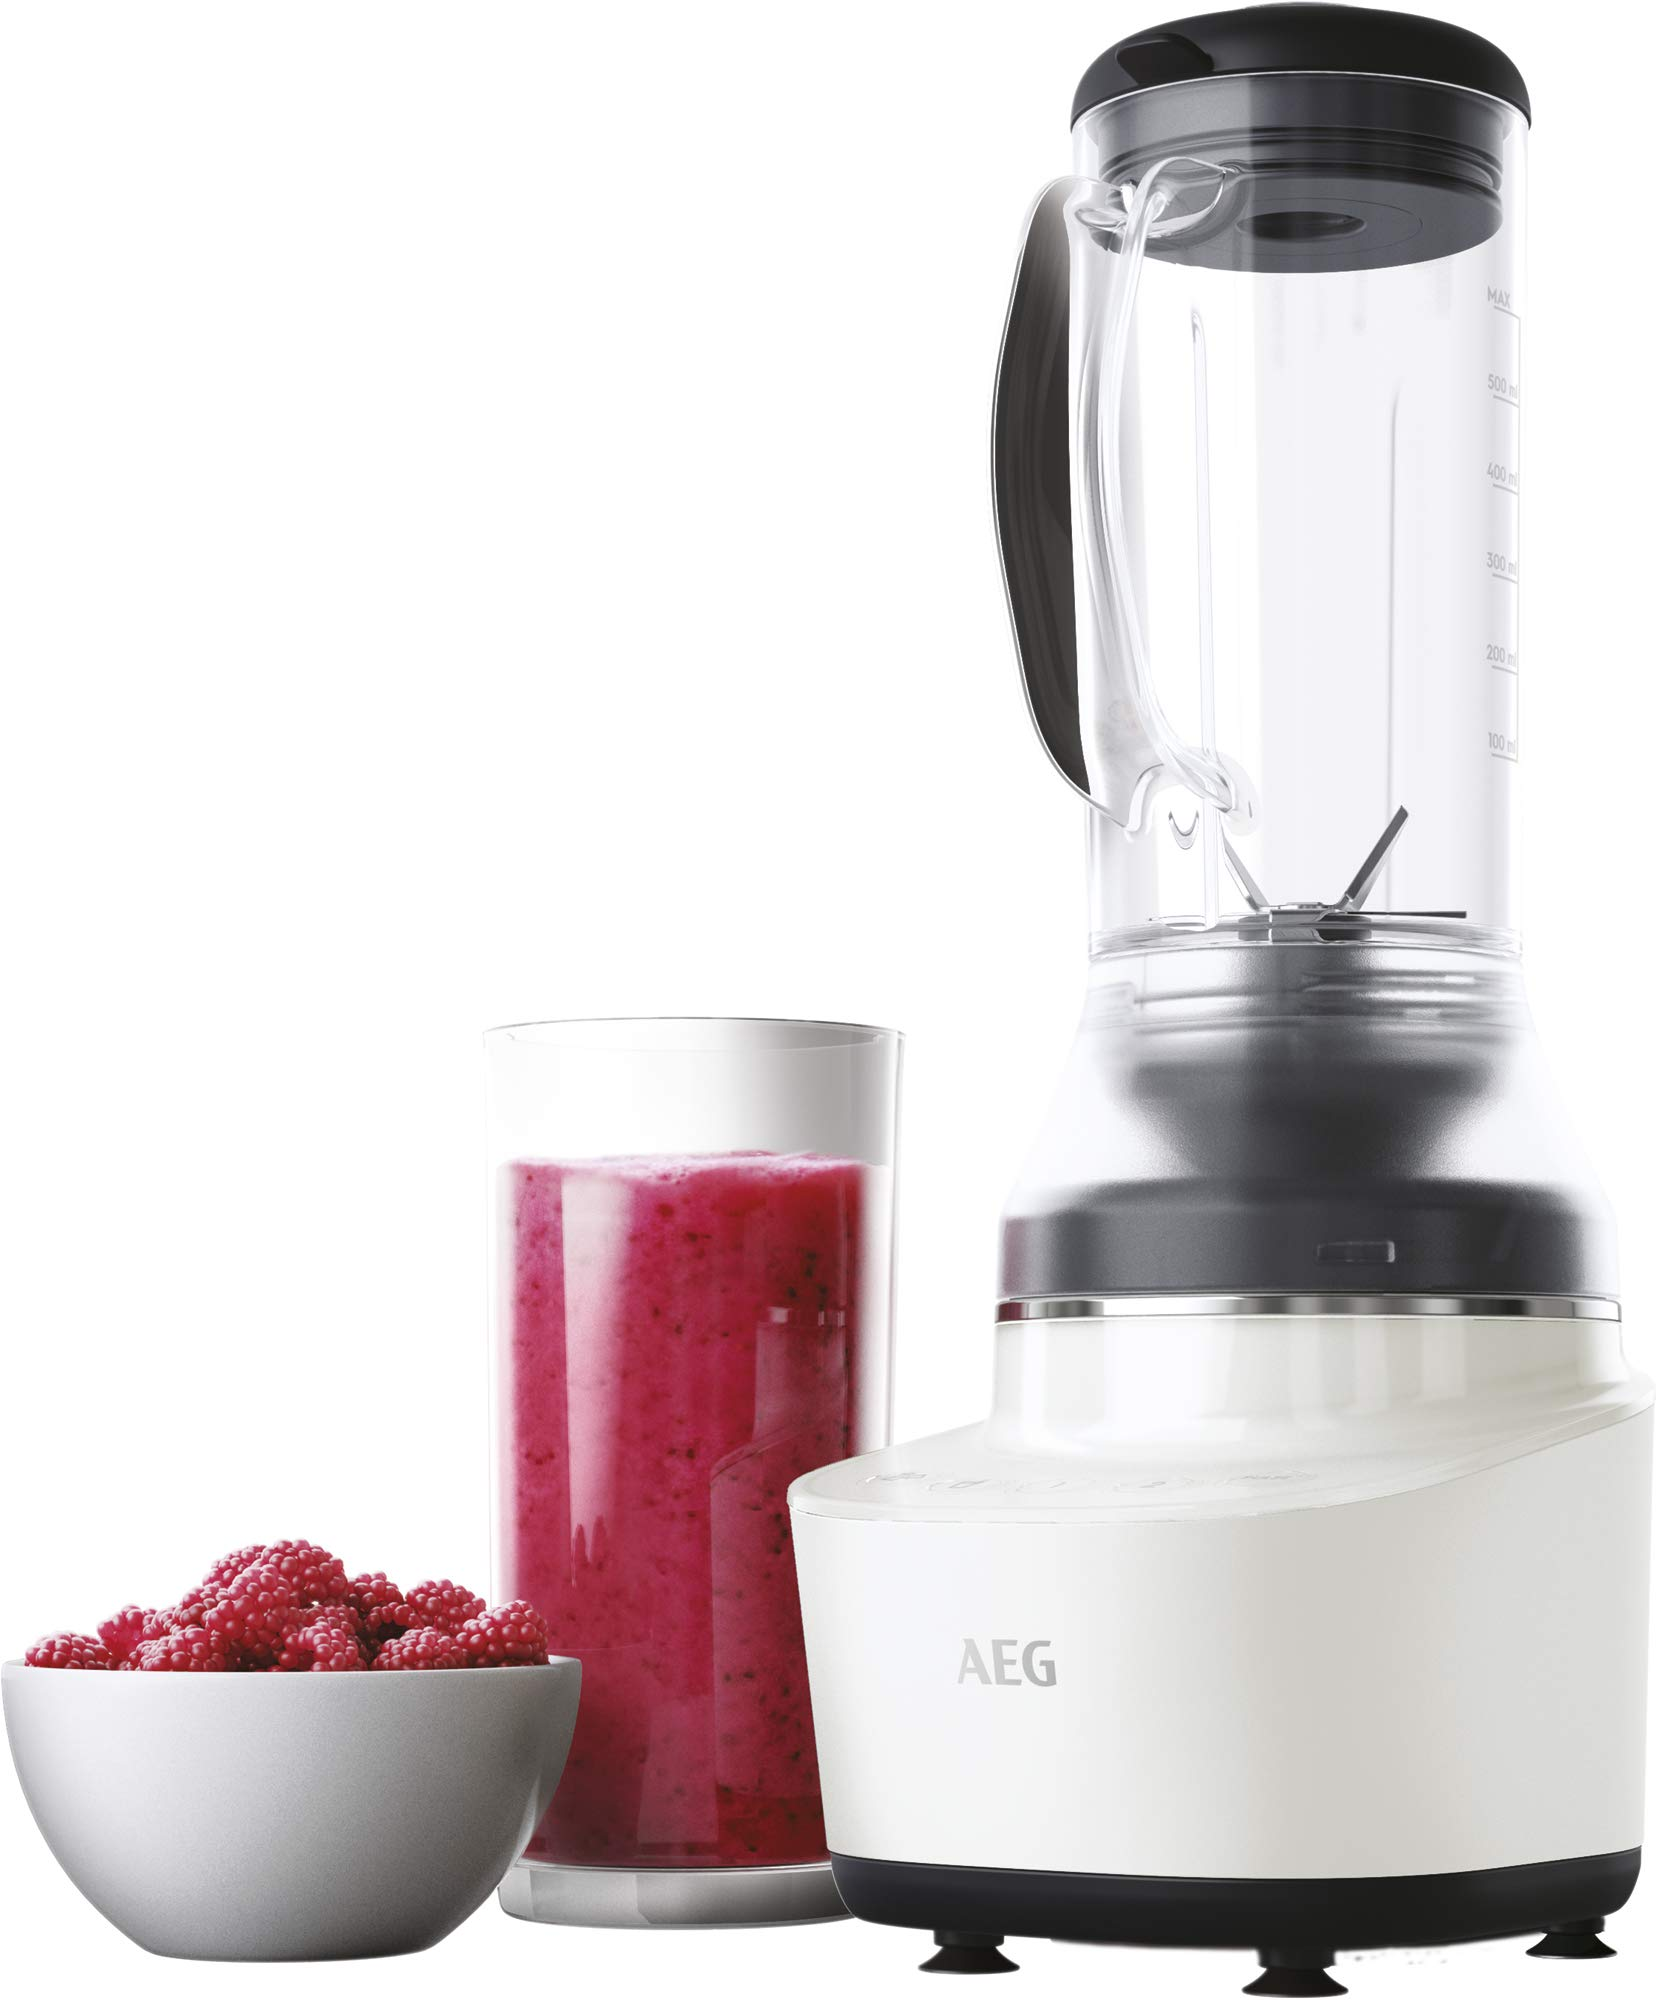 AEG-Gourmet-7-Kompaktmixer-CB7-1-4CW-12-PS-2-Stufen-plus-2-Rezeptprogramme-06-l-Tritan-Krug-6-Klingen-Edelstahlmesser-Tasten-mit-LED-Hinterleuchtung-BPA-frei-weischwarz